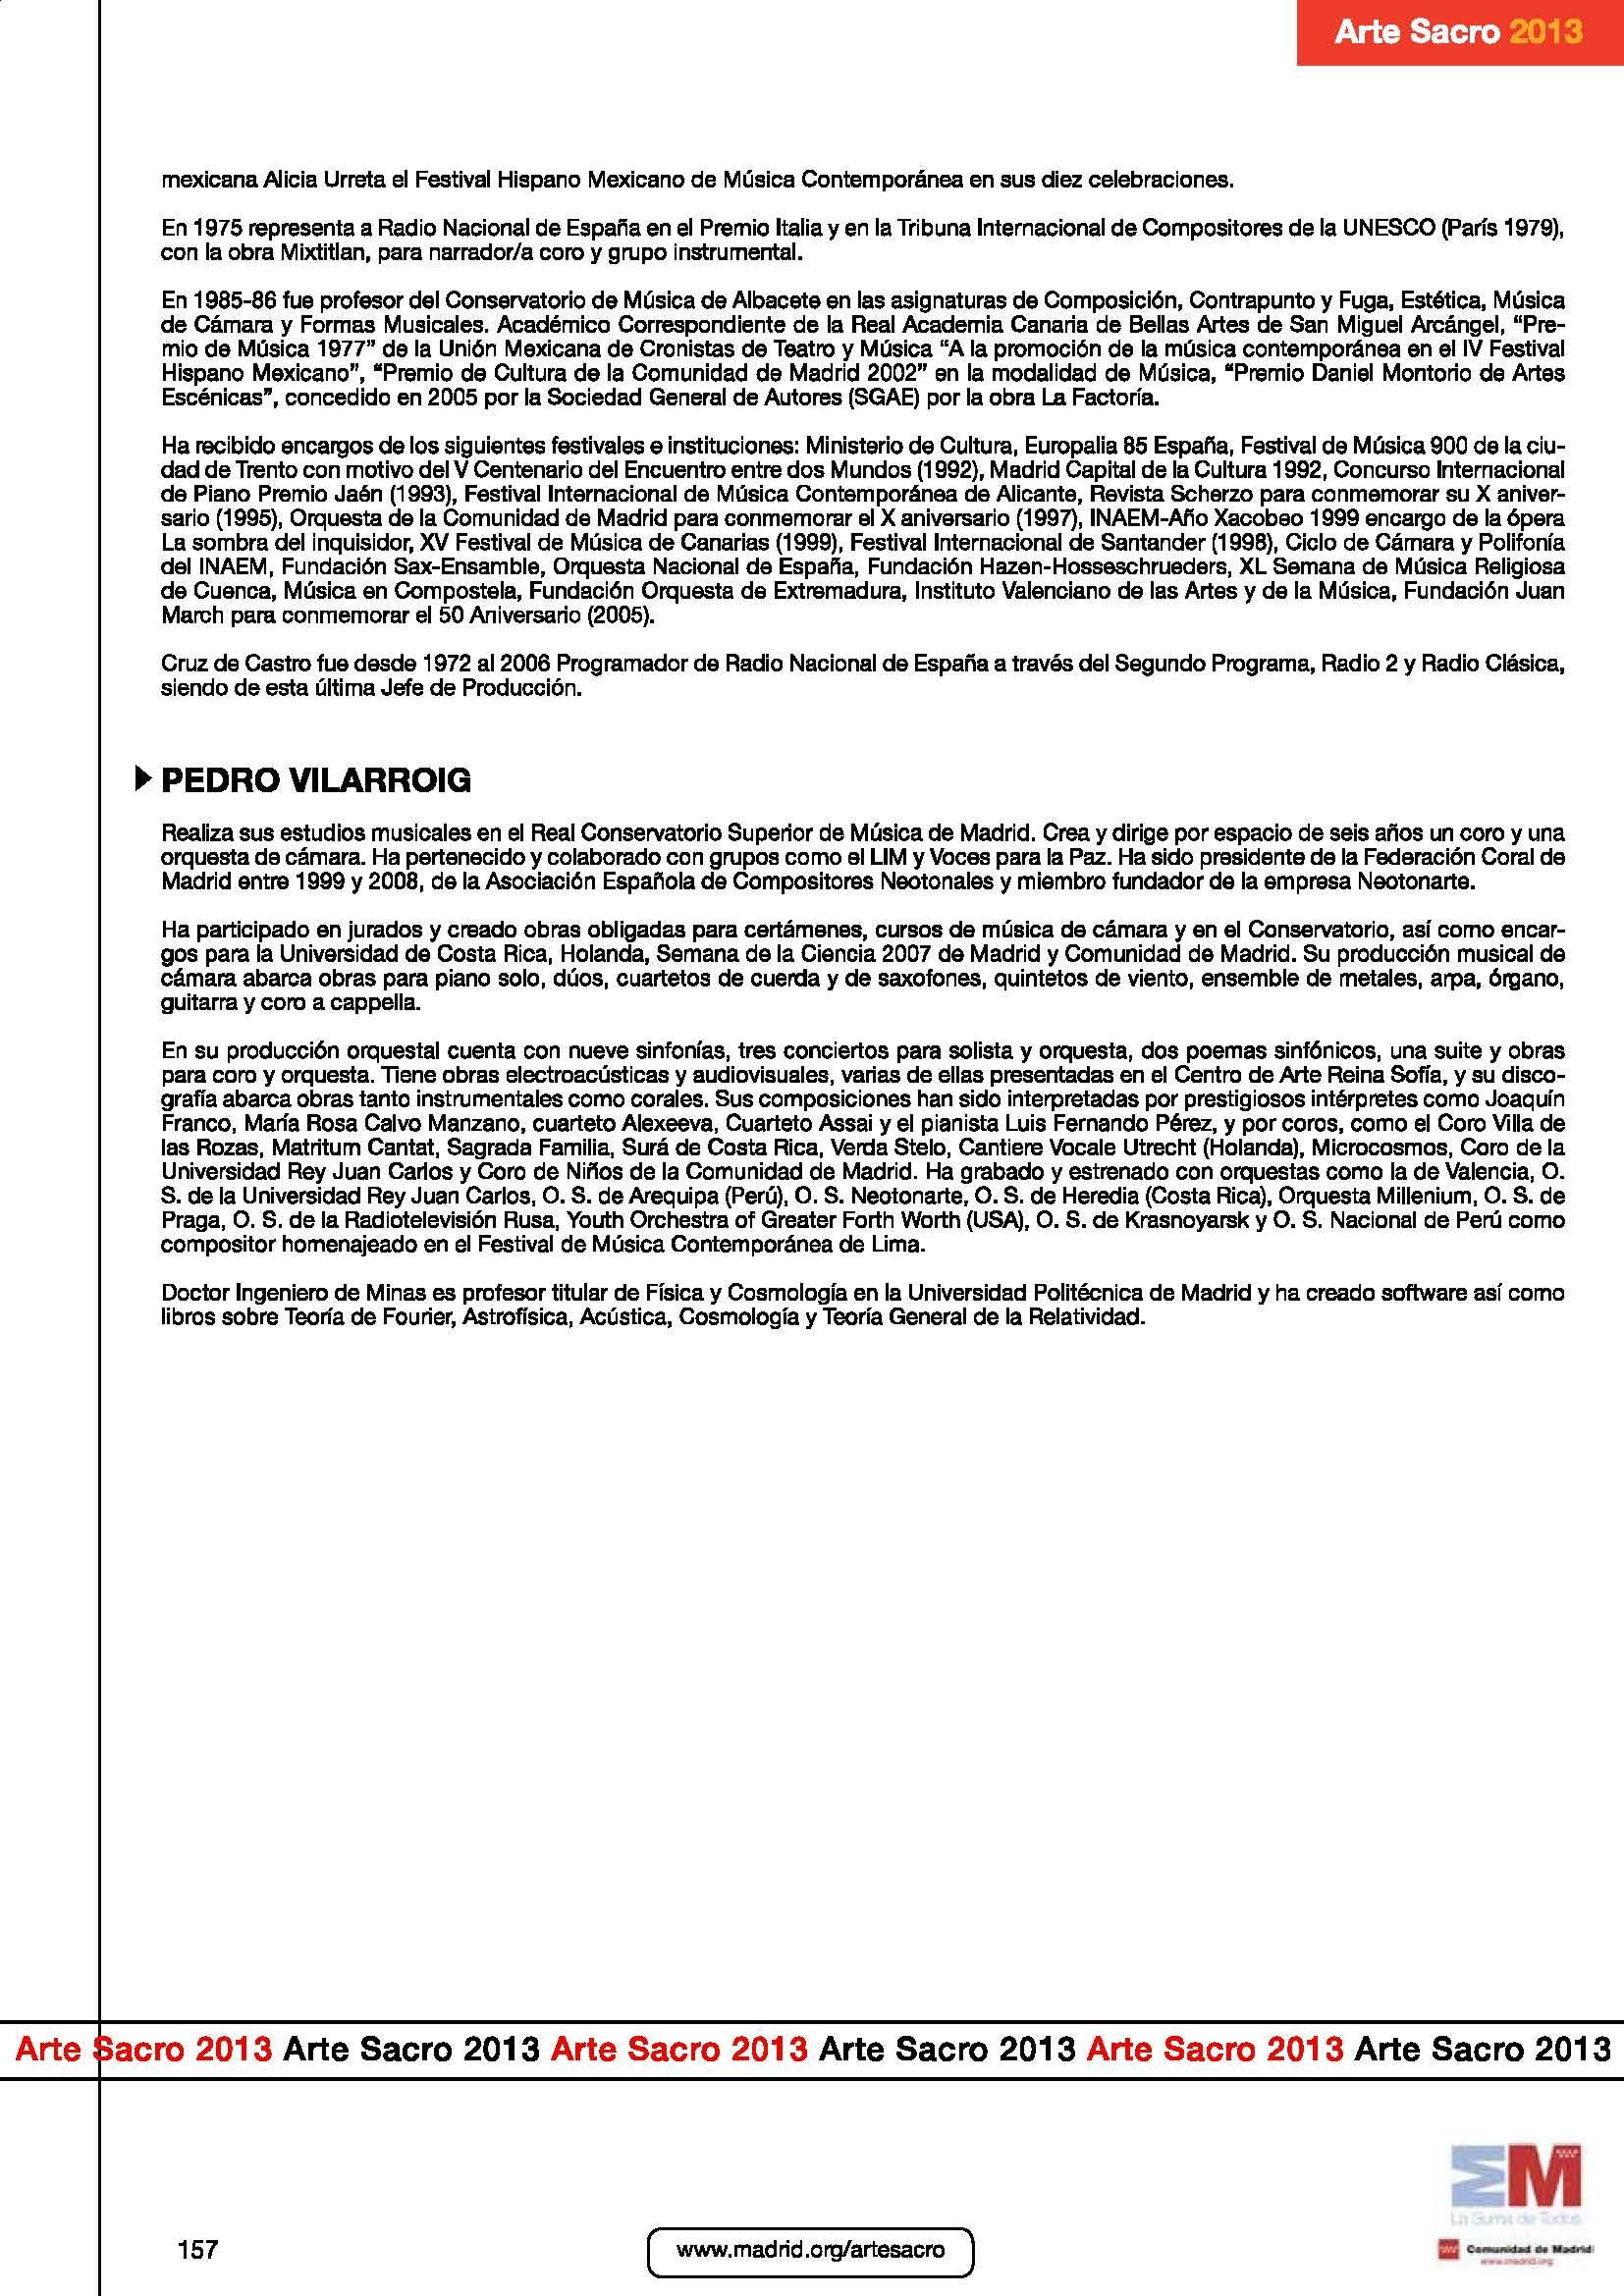 dossier_completo_Página_157